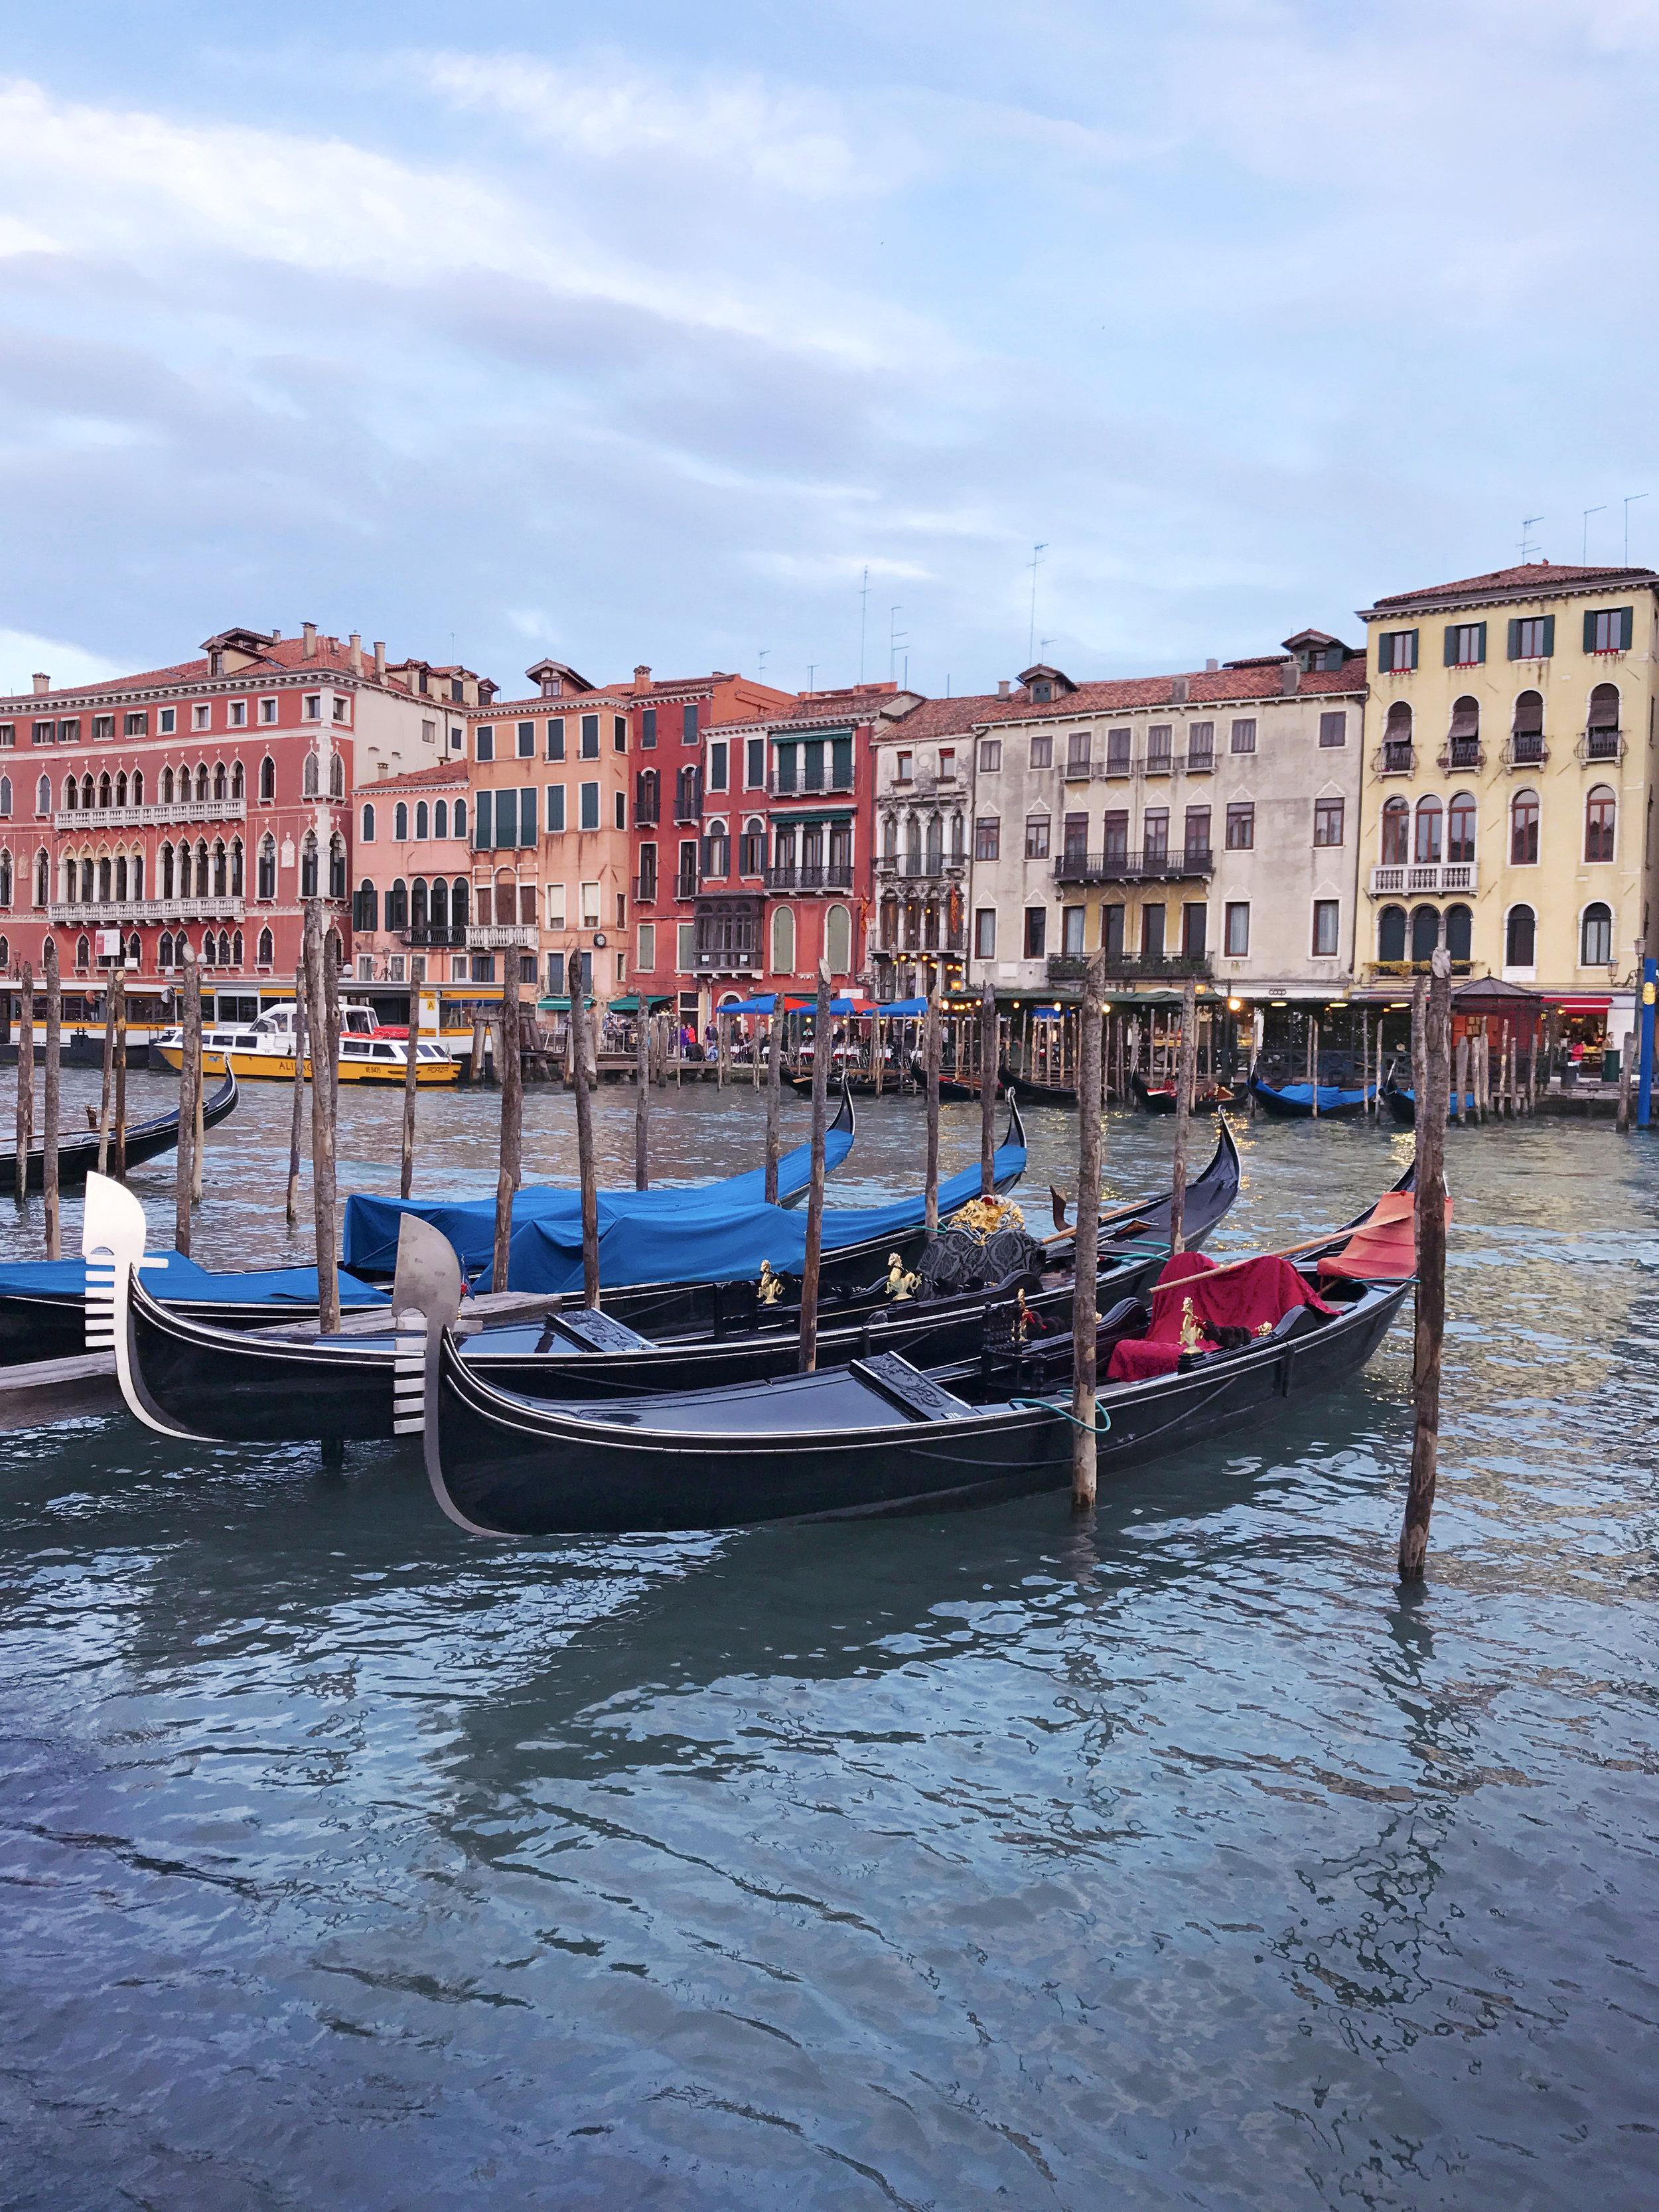 Gondolas along the Grand Canal, Venezia